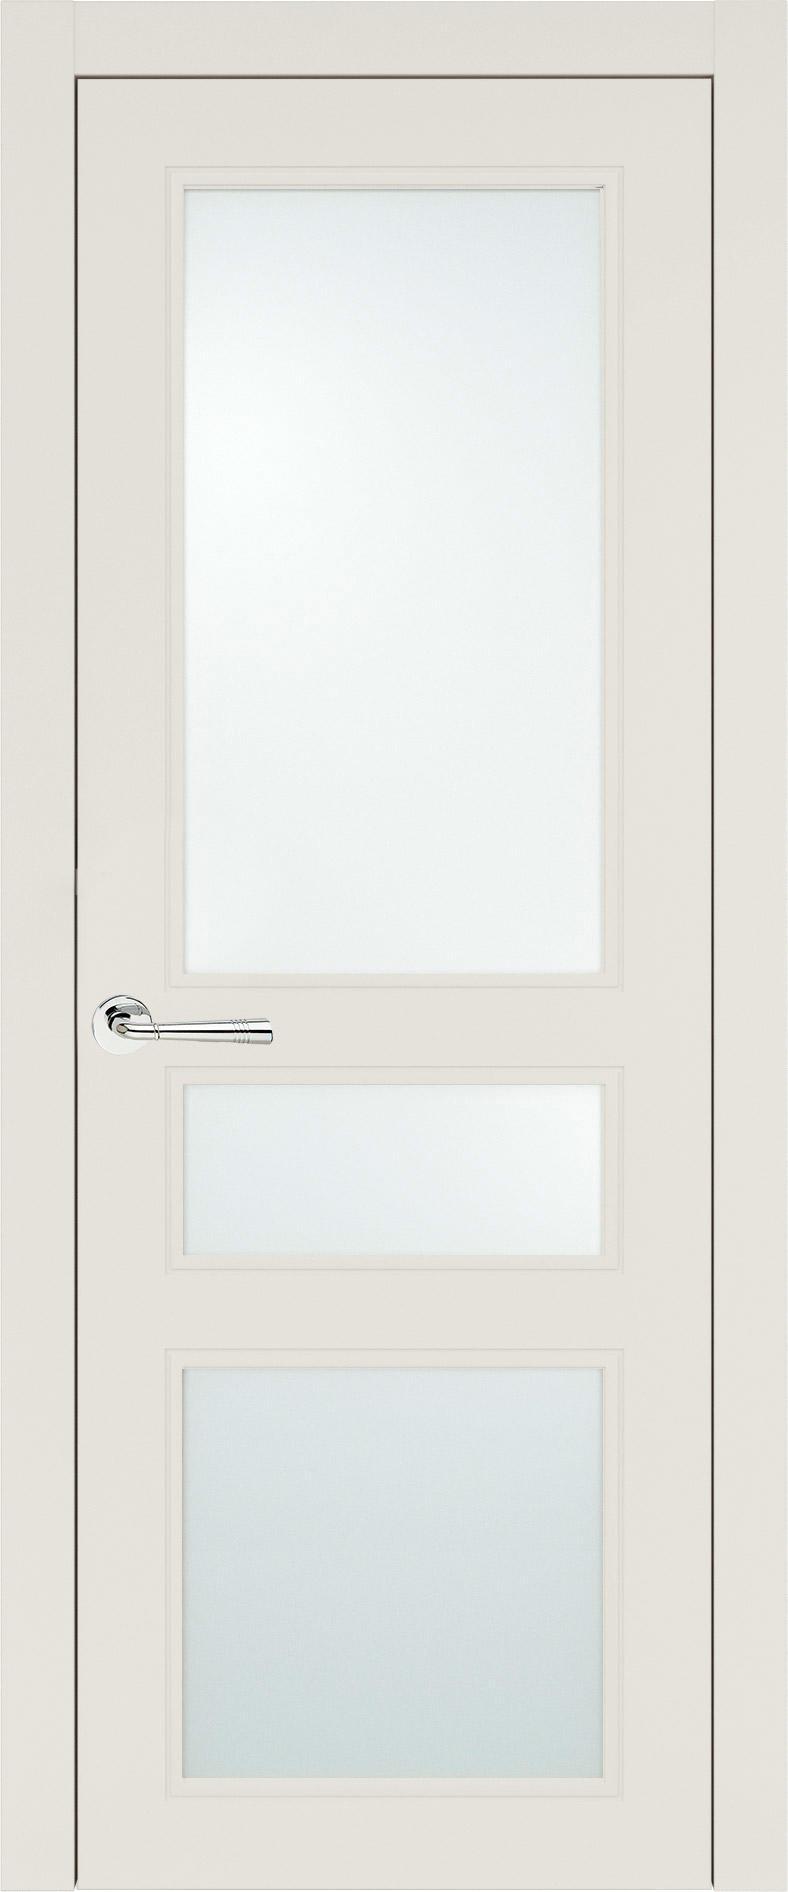 Imperia-R Neo Classic цвет - Бежевая эмаль (RAL 9010) Со стеклом (ДО)